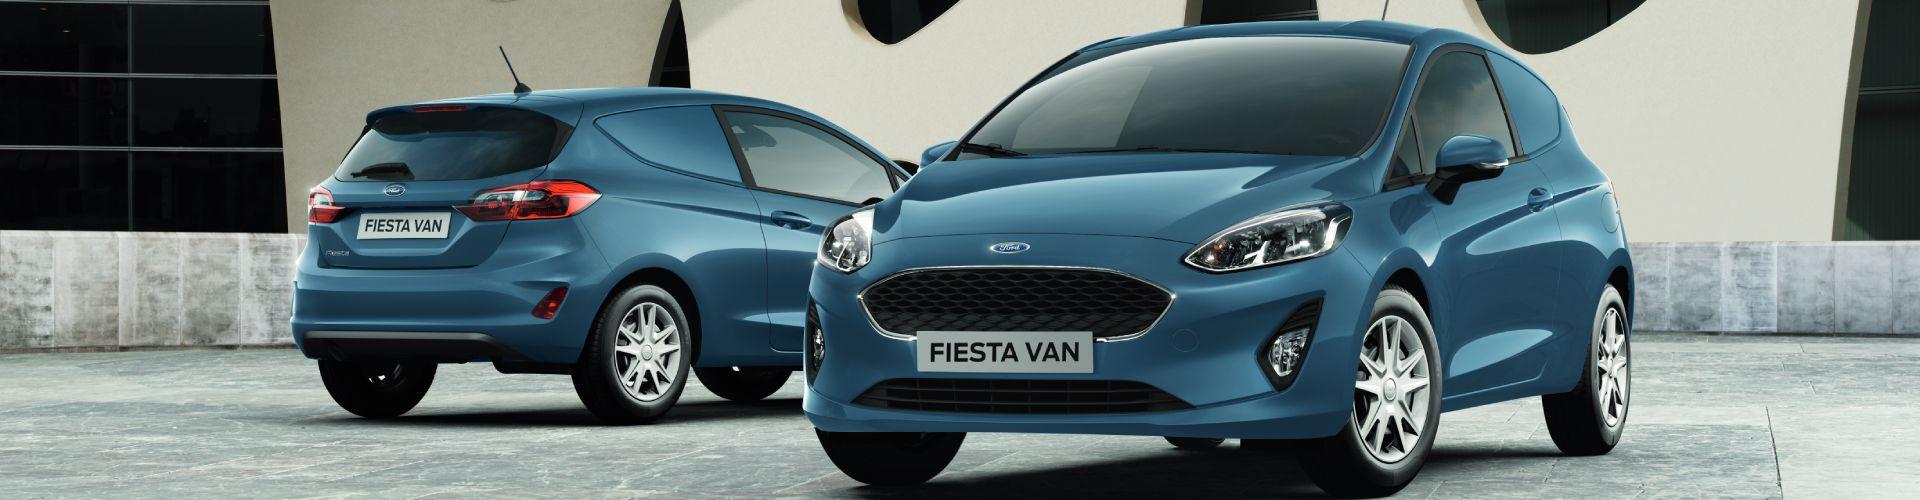 Ford Fiesta Van - Liapis Bros